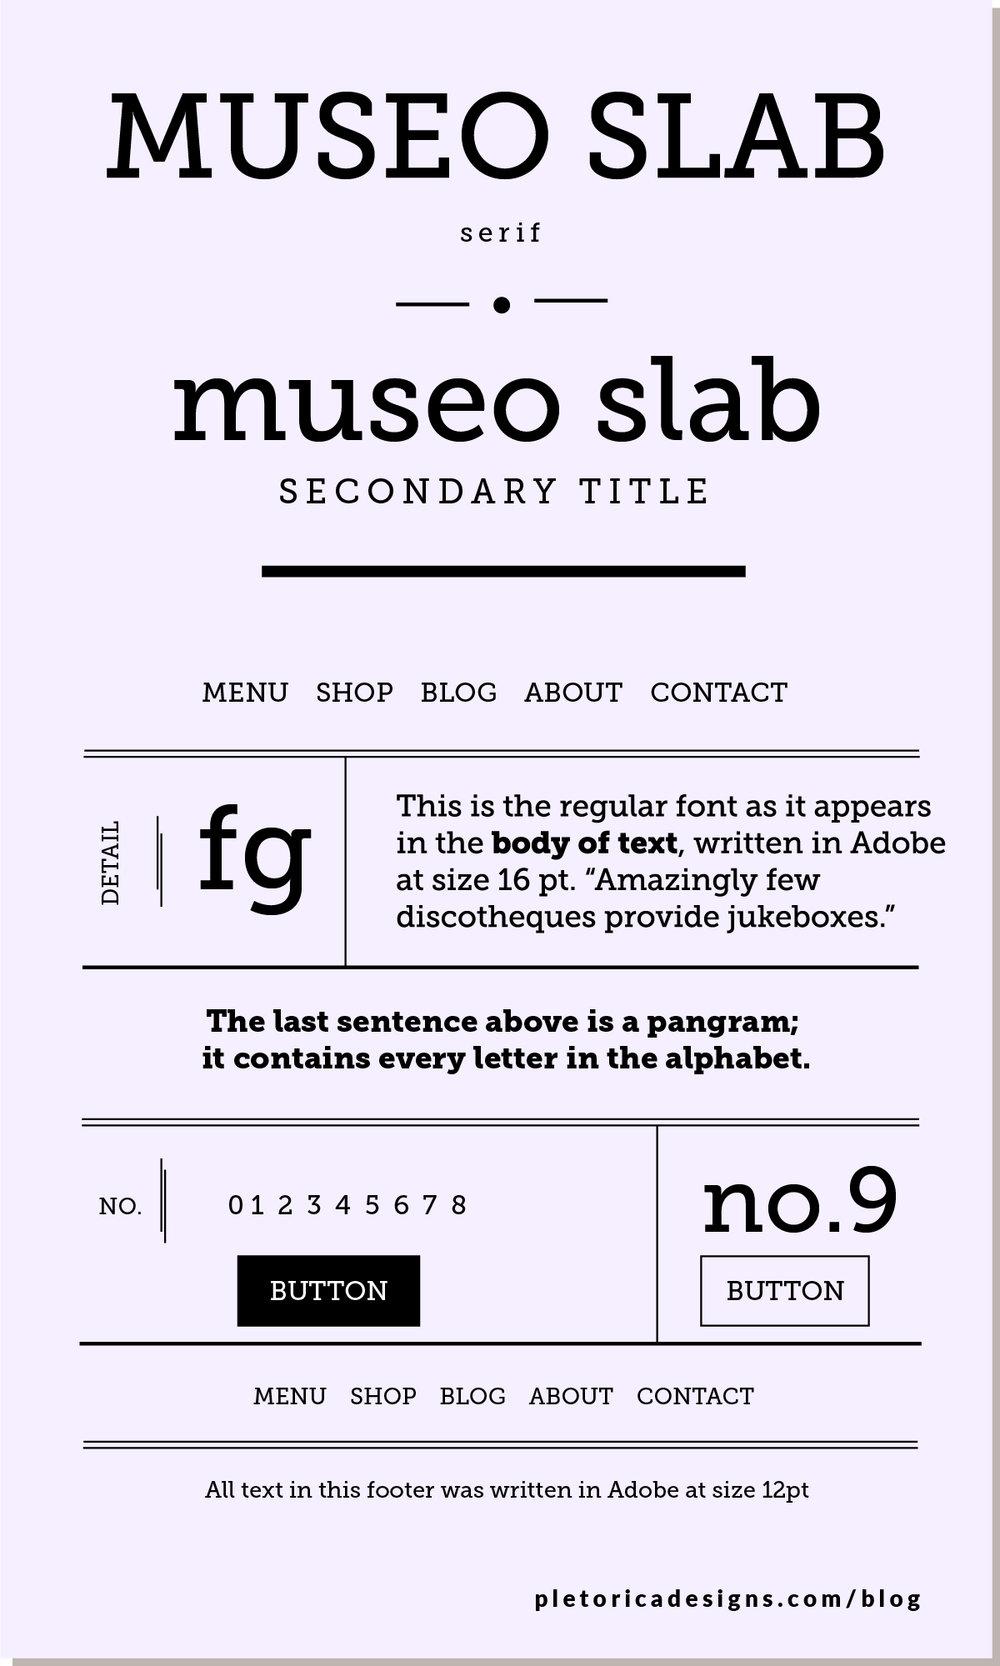 POSTER_MuseoSlab.jpg